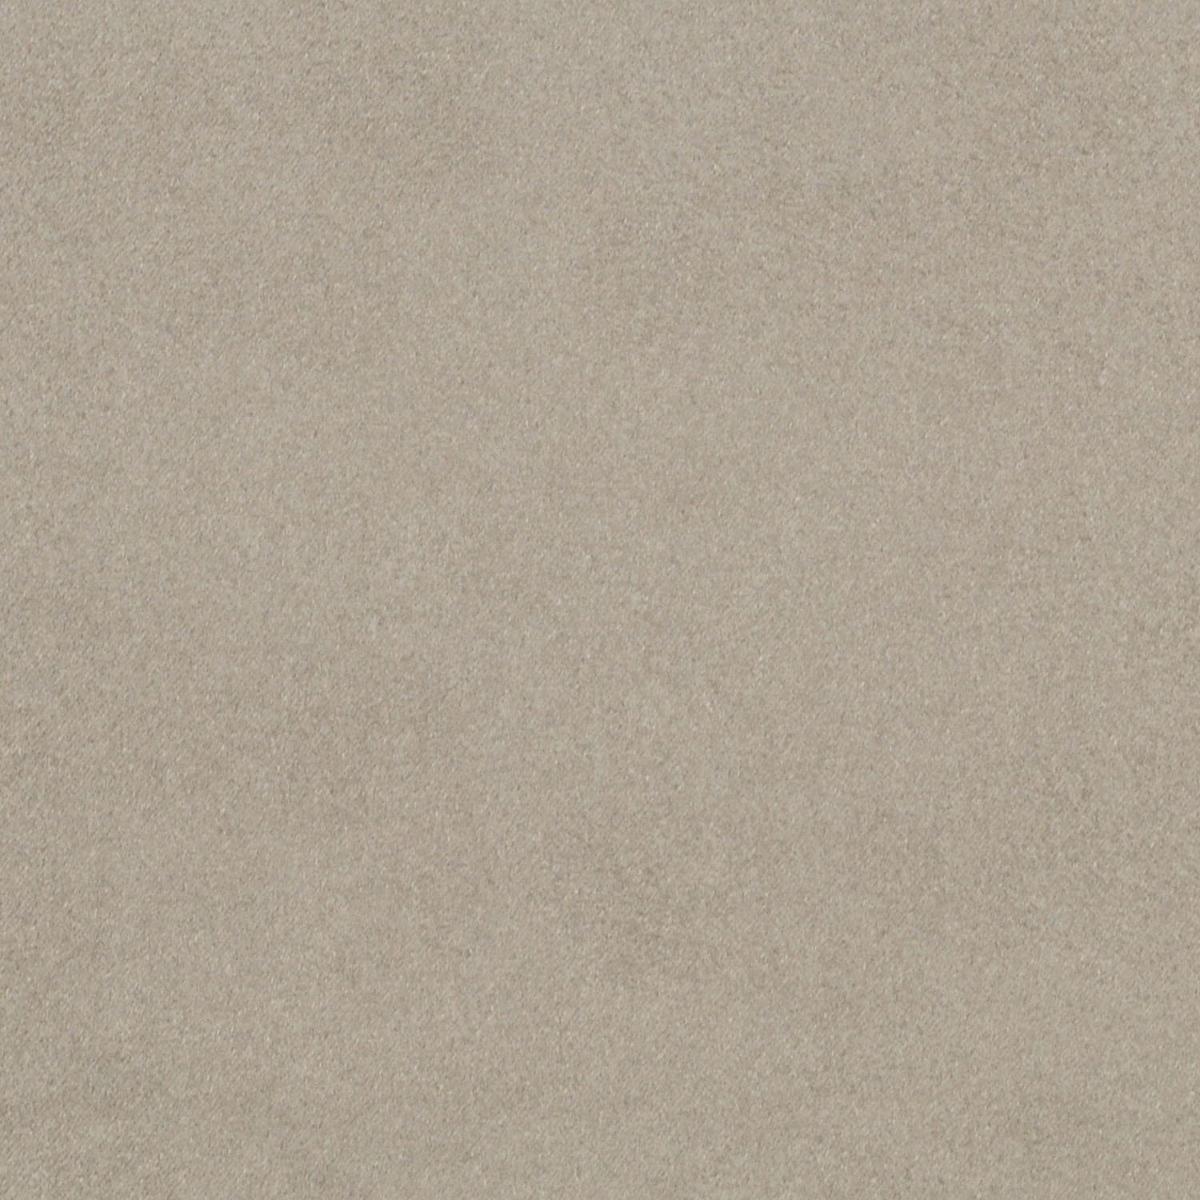 Nubuck Sepia